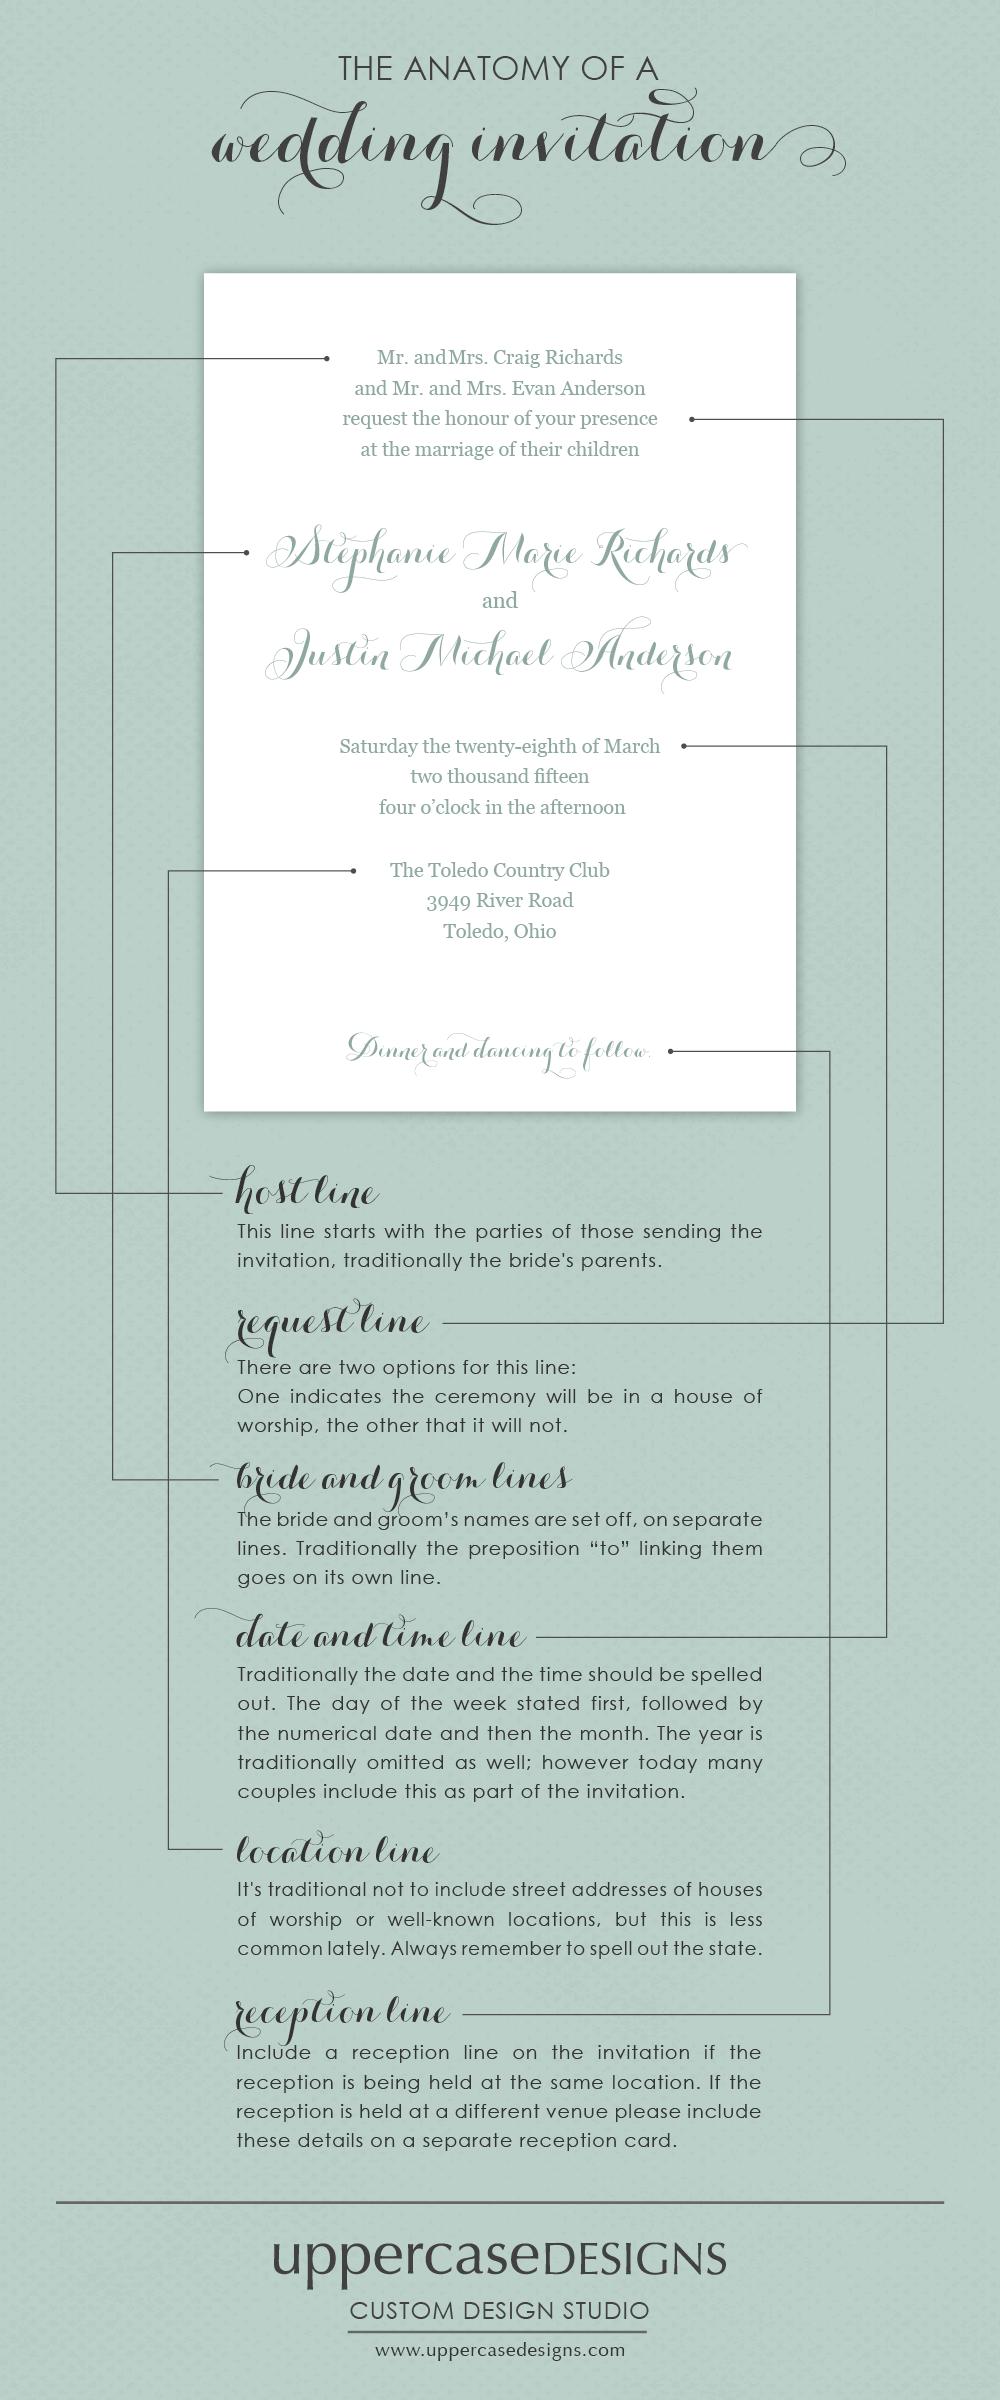 anatomy-of-a-wedding-invitation-UCD.png